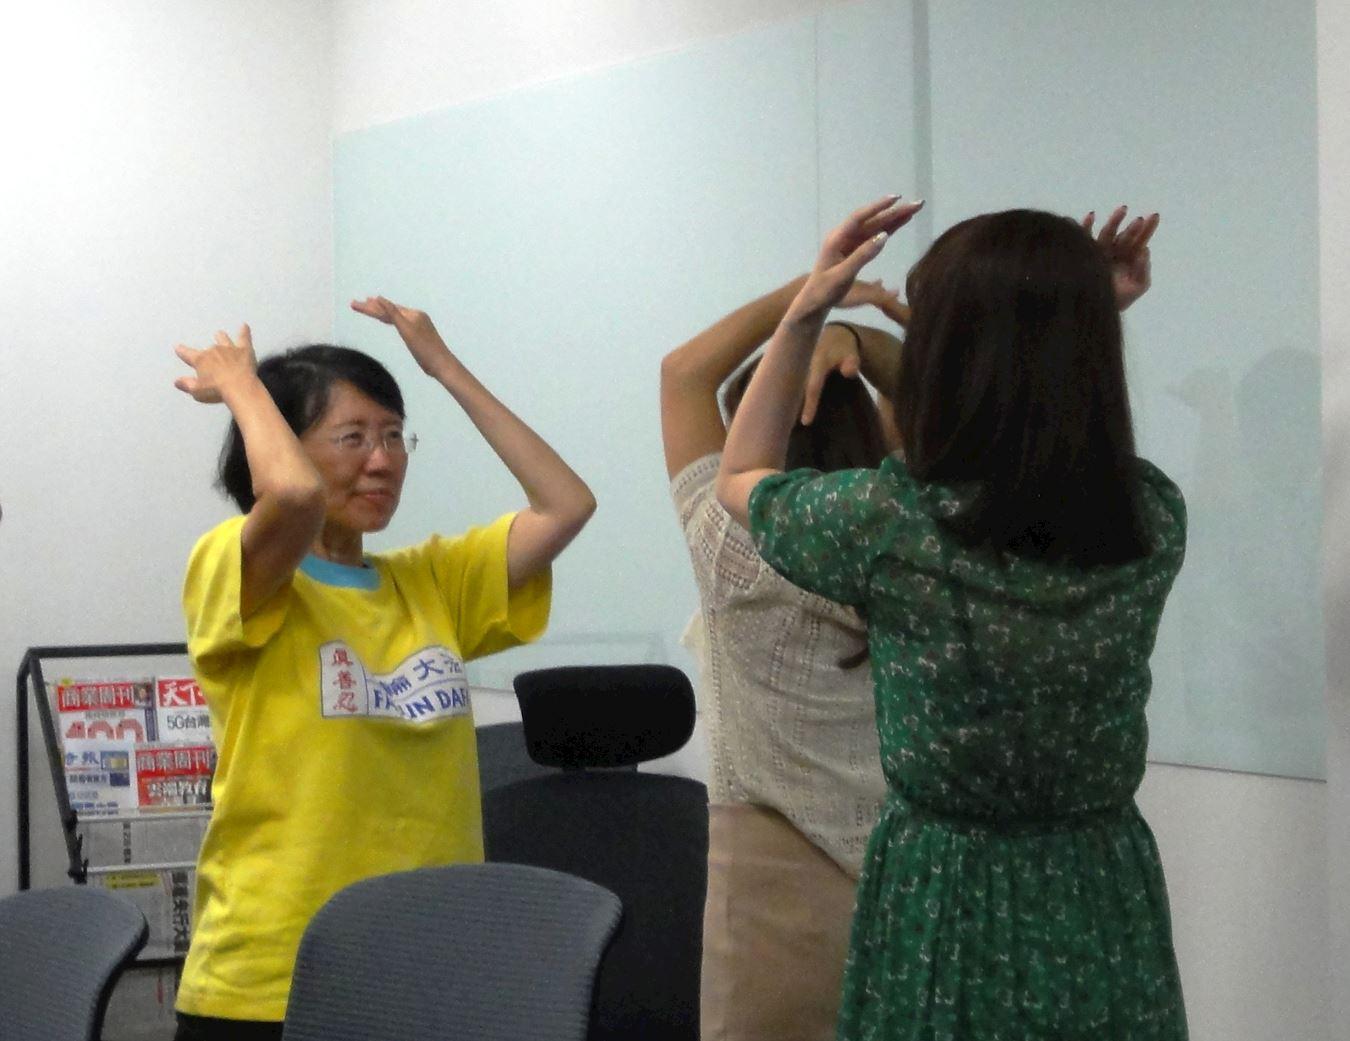 Seorang praktisi Falun Dafa sedang memeragakan latihan keempat